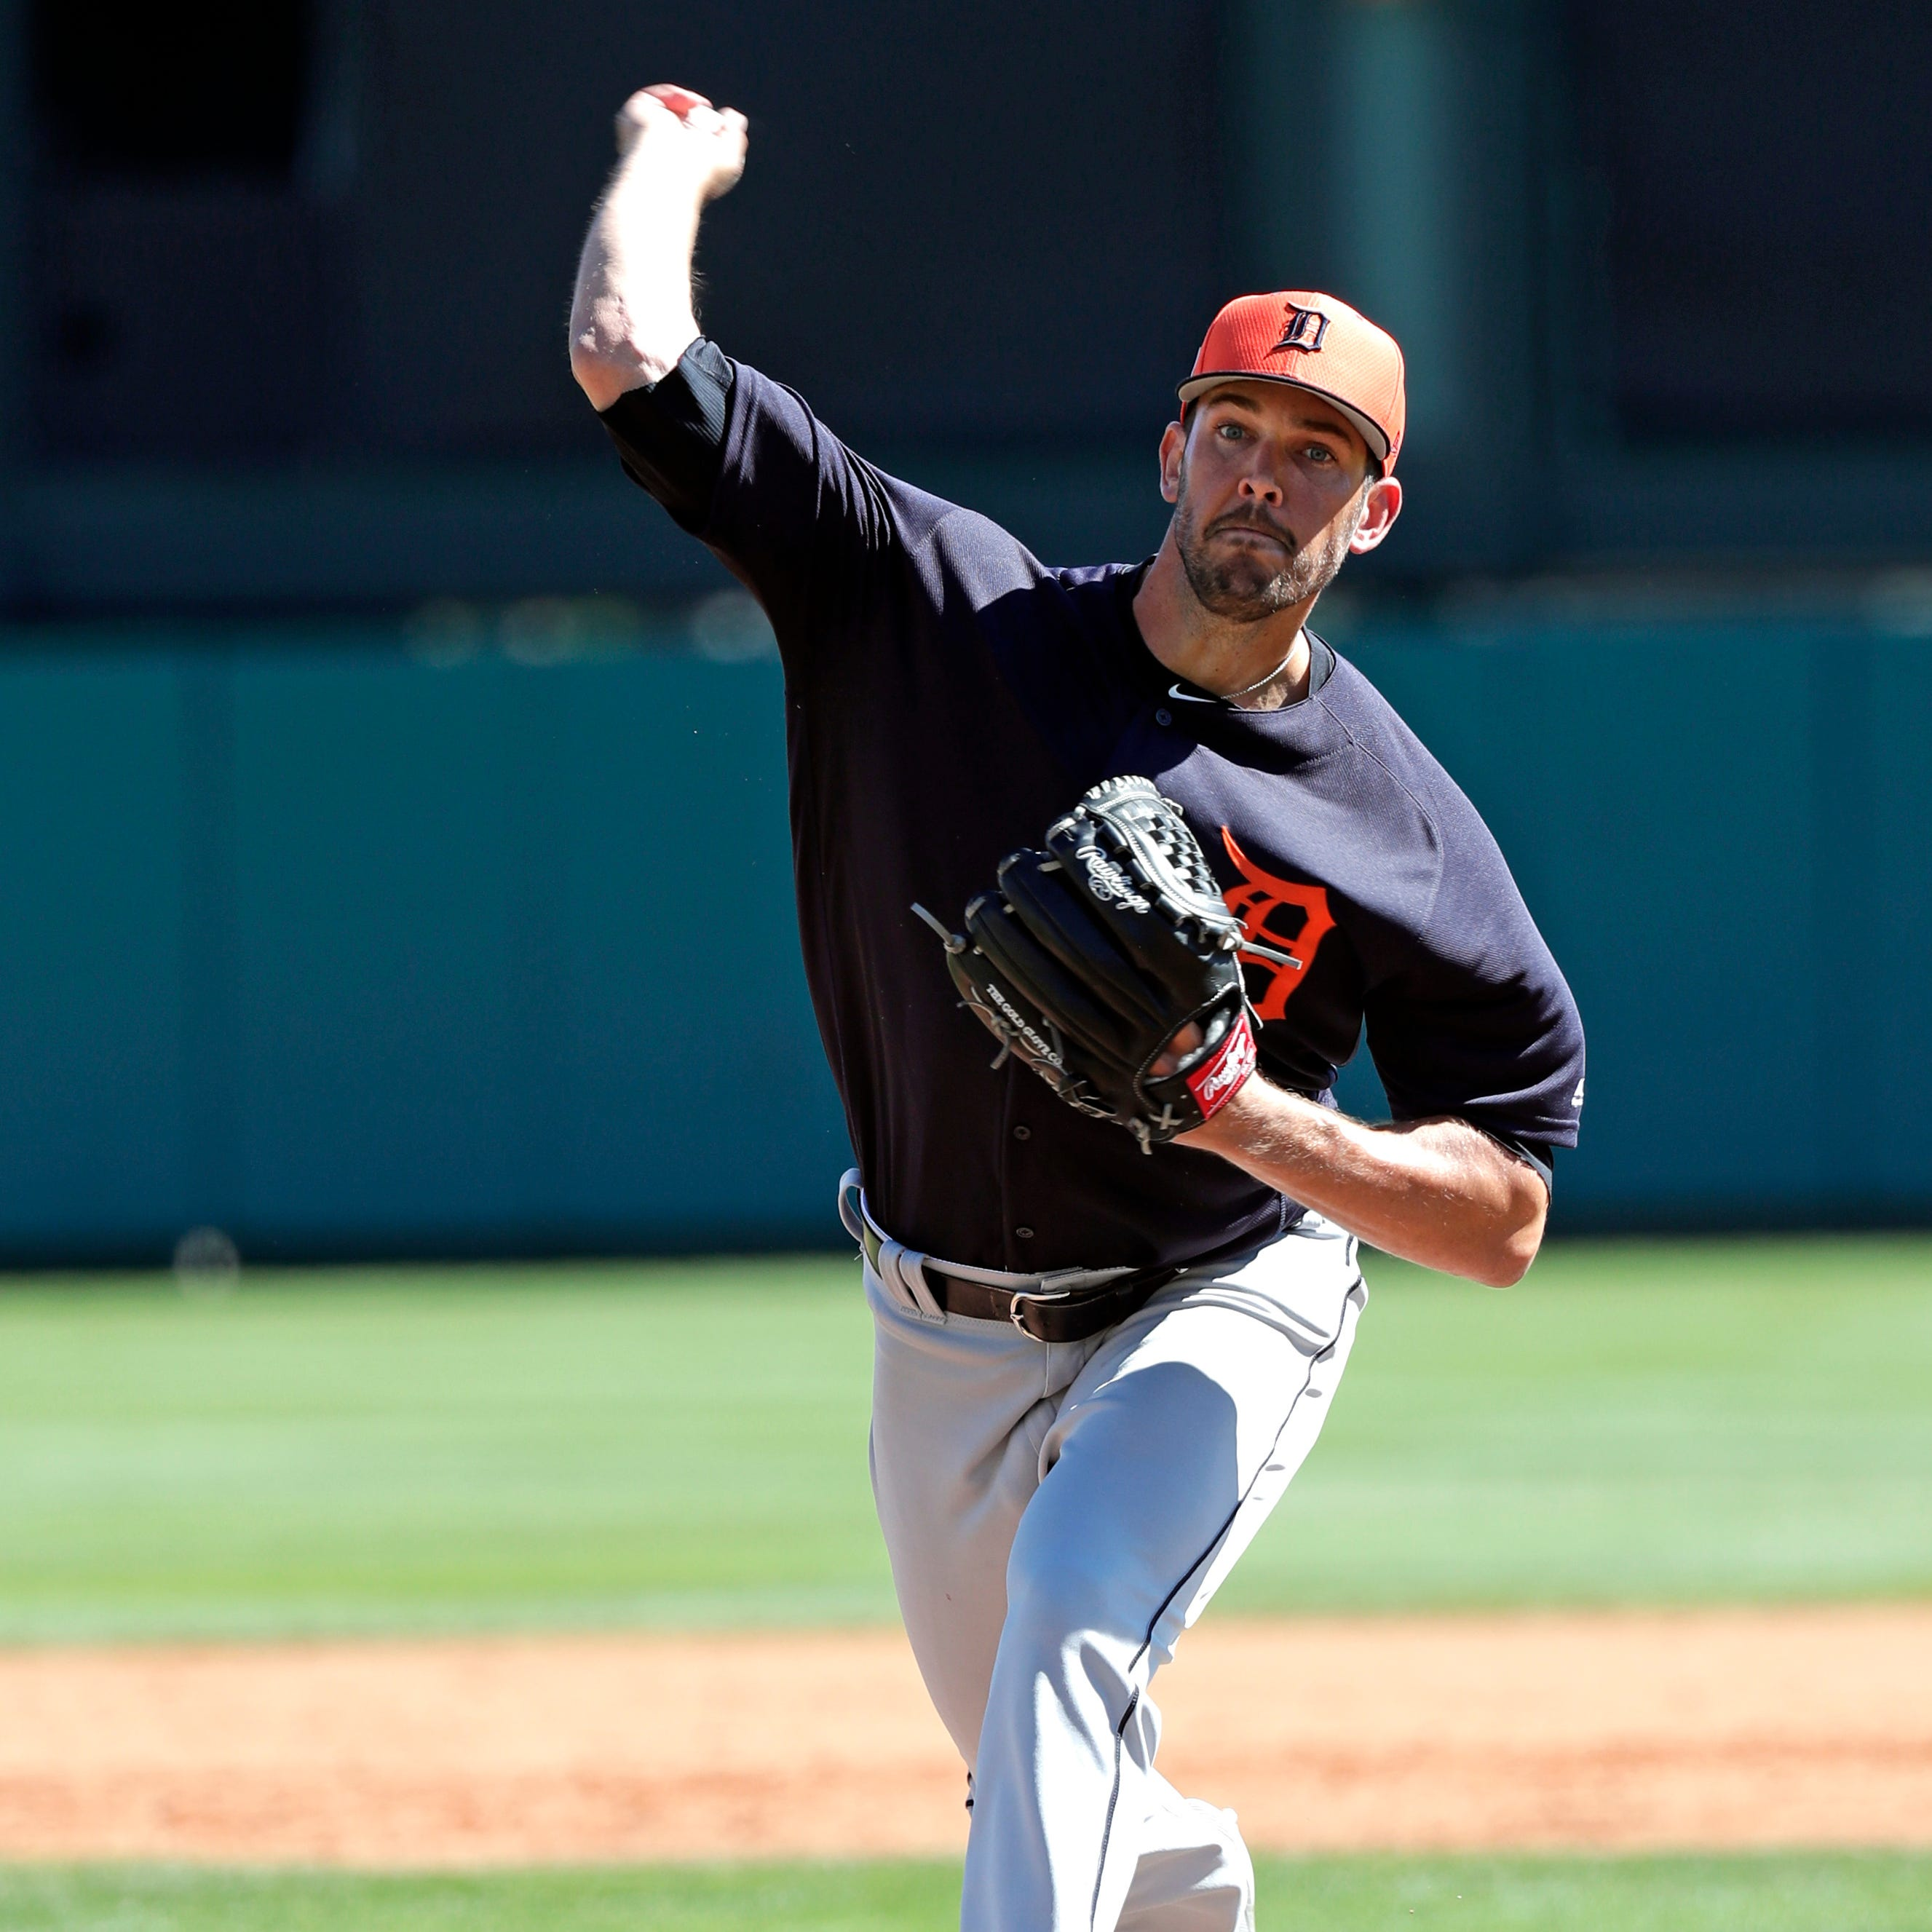 Tigers' VerHagen hopes shoulder issue is just 'spring training cobwebs'